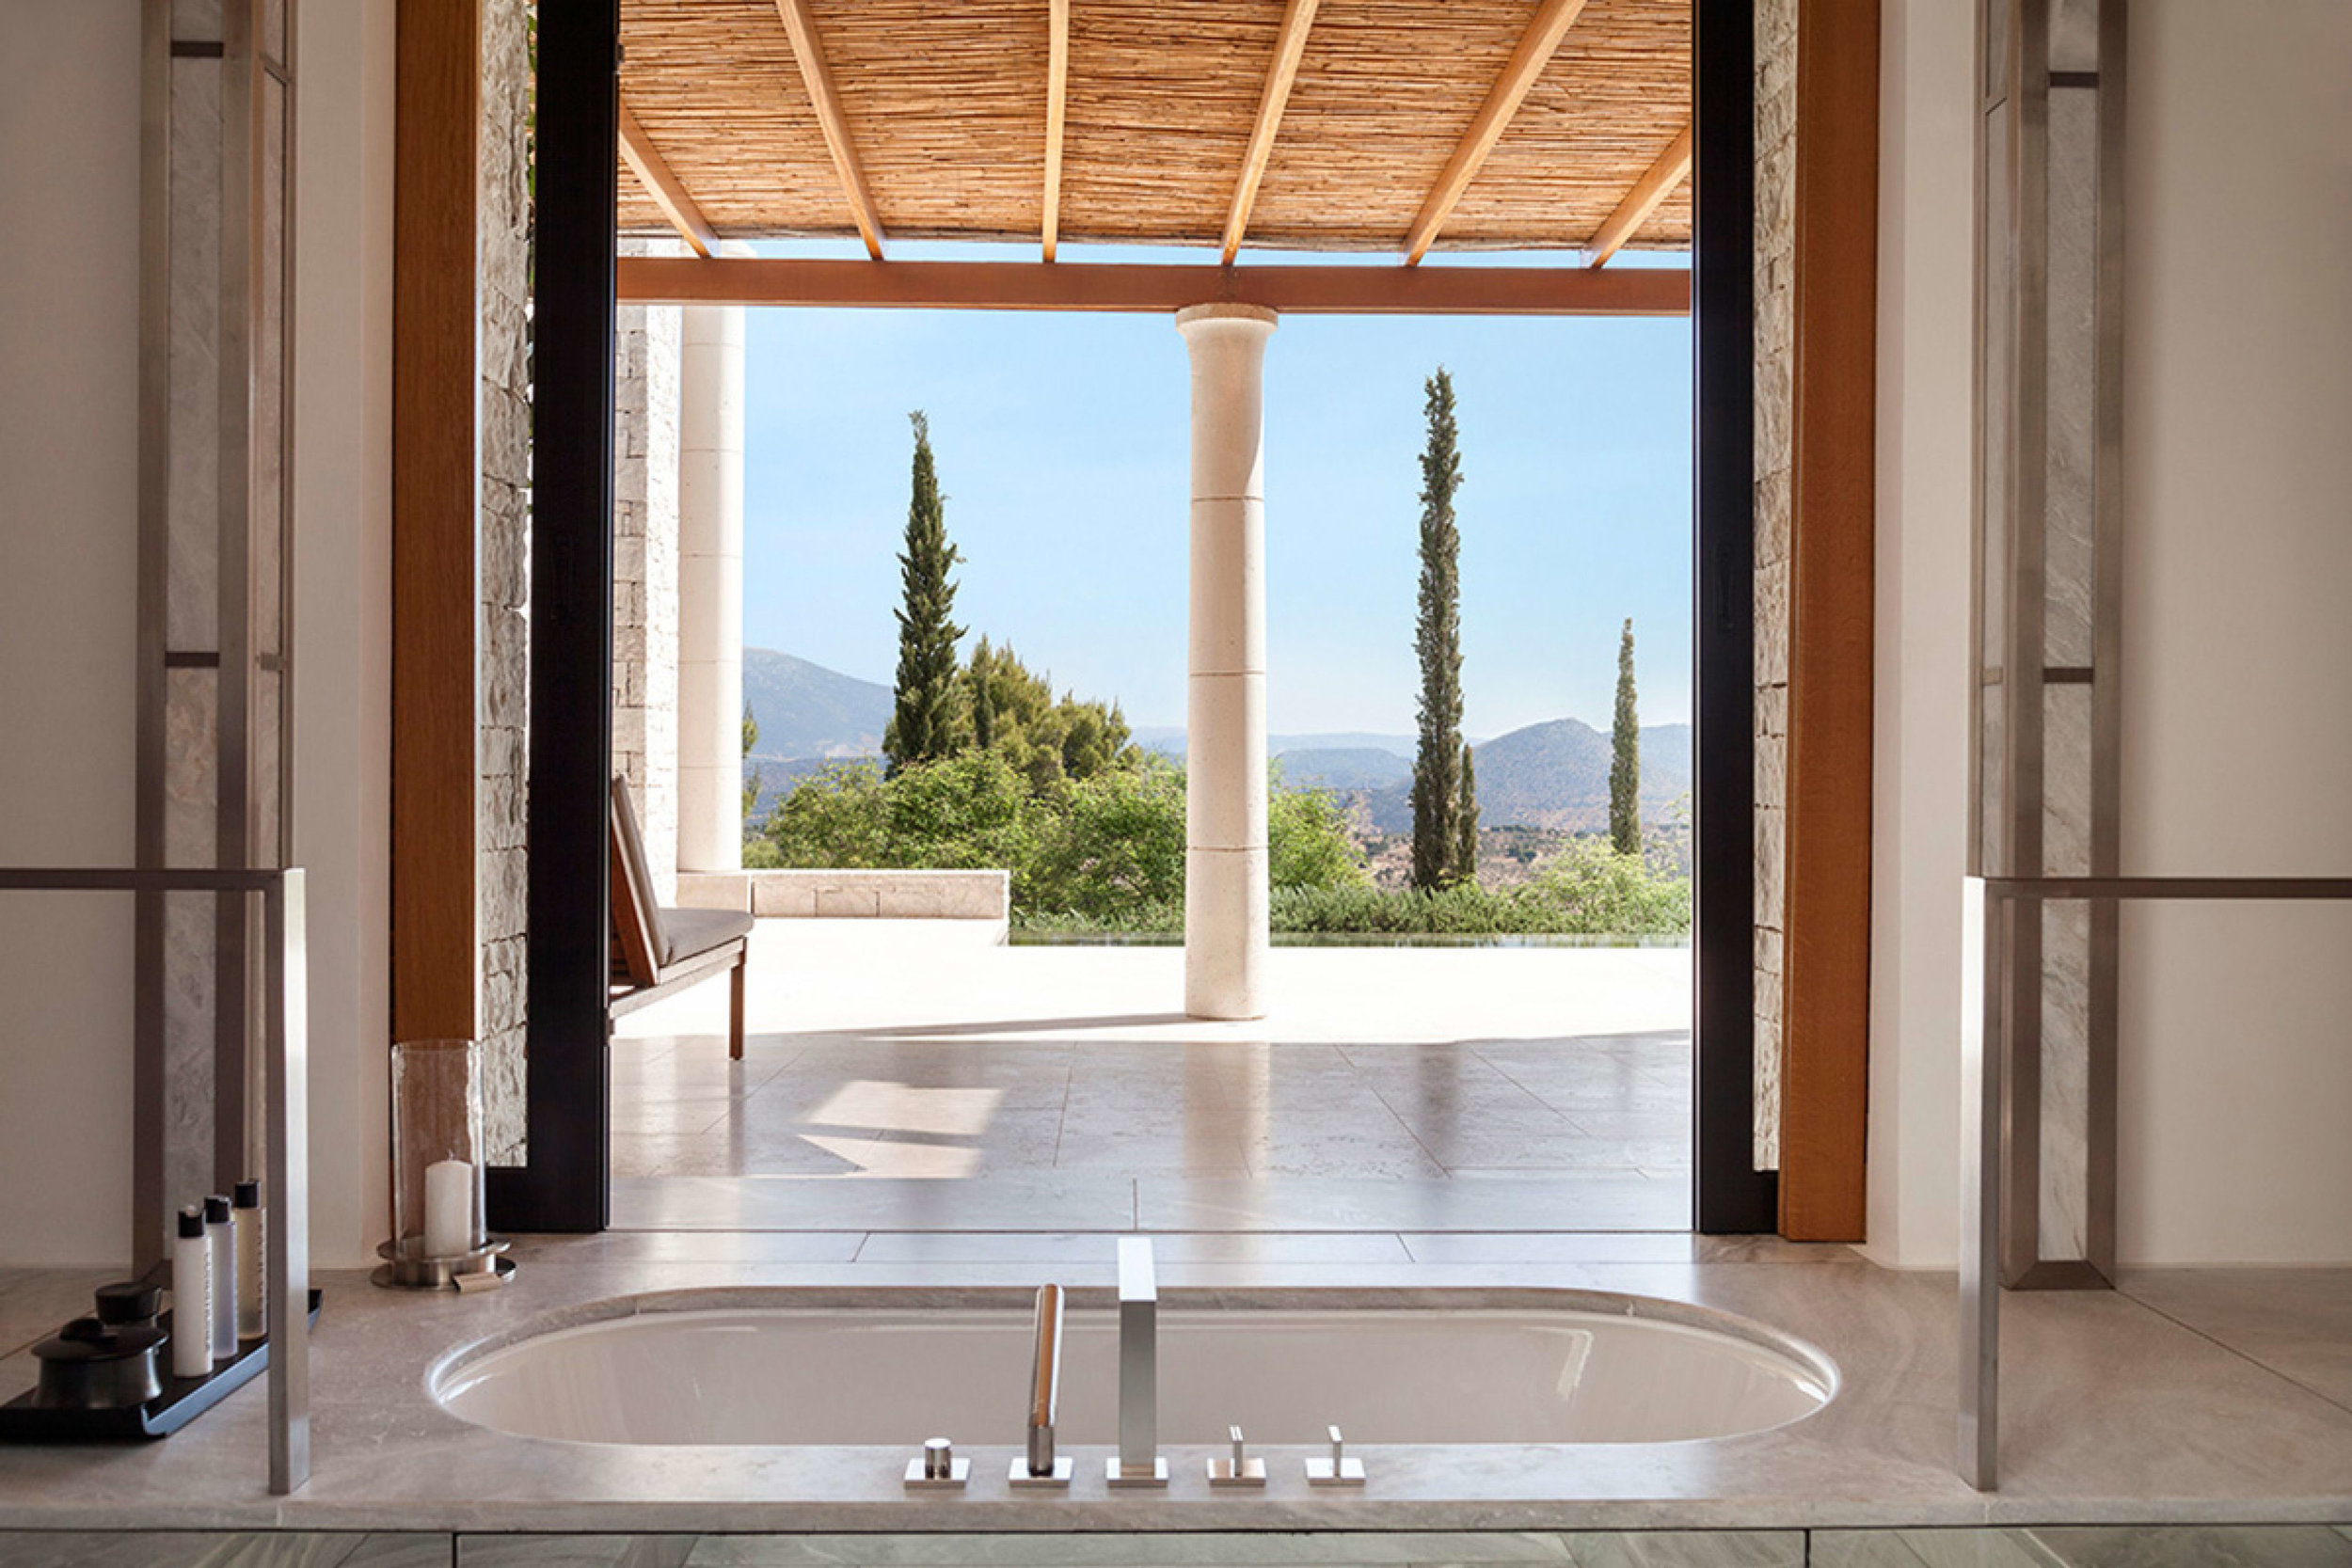 amanzoe-pavilion-bath-tub-1200x800.jpg